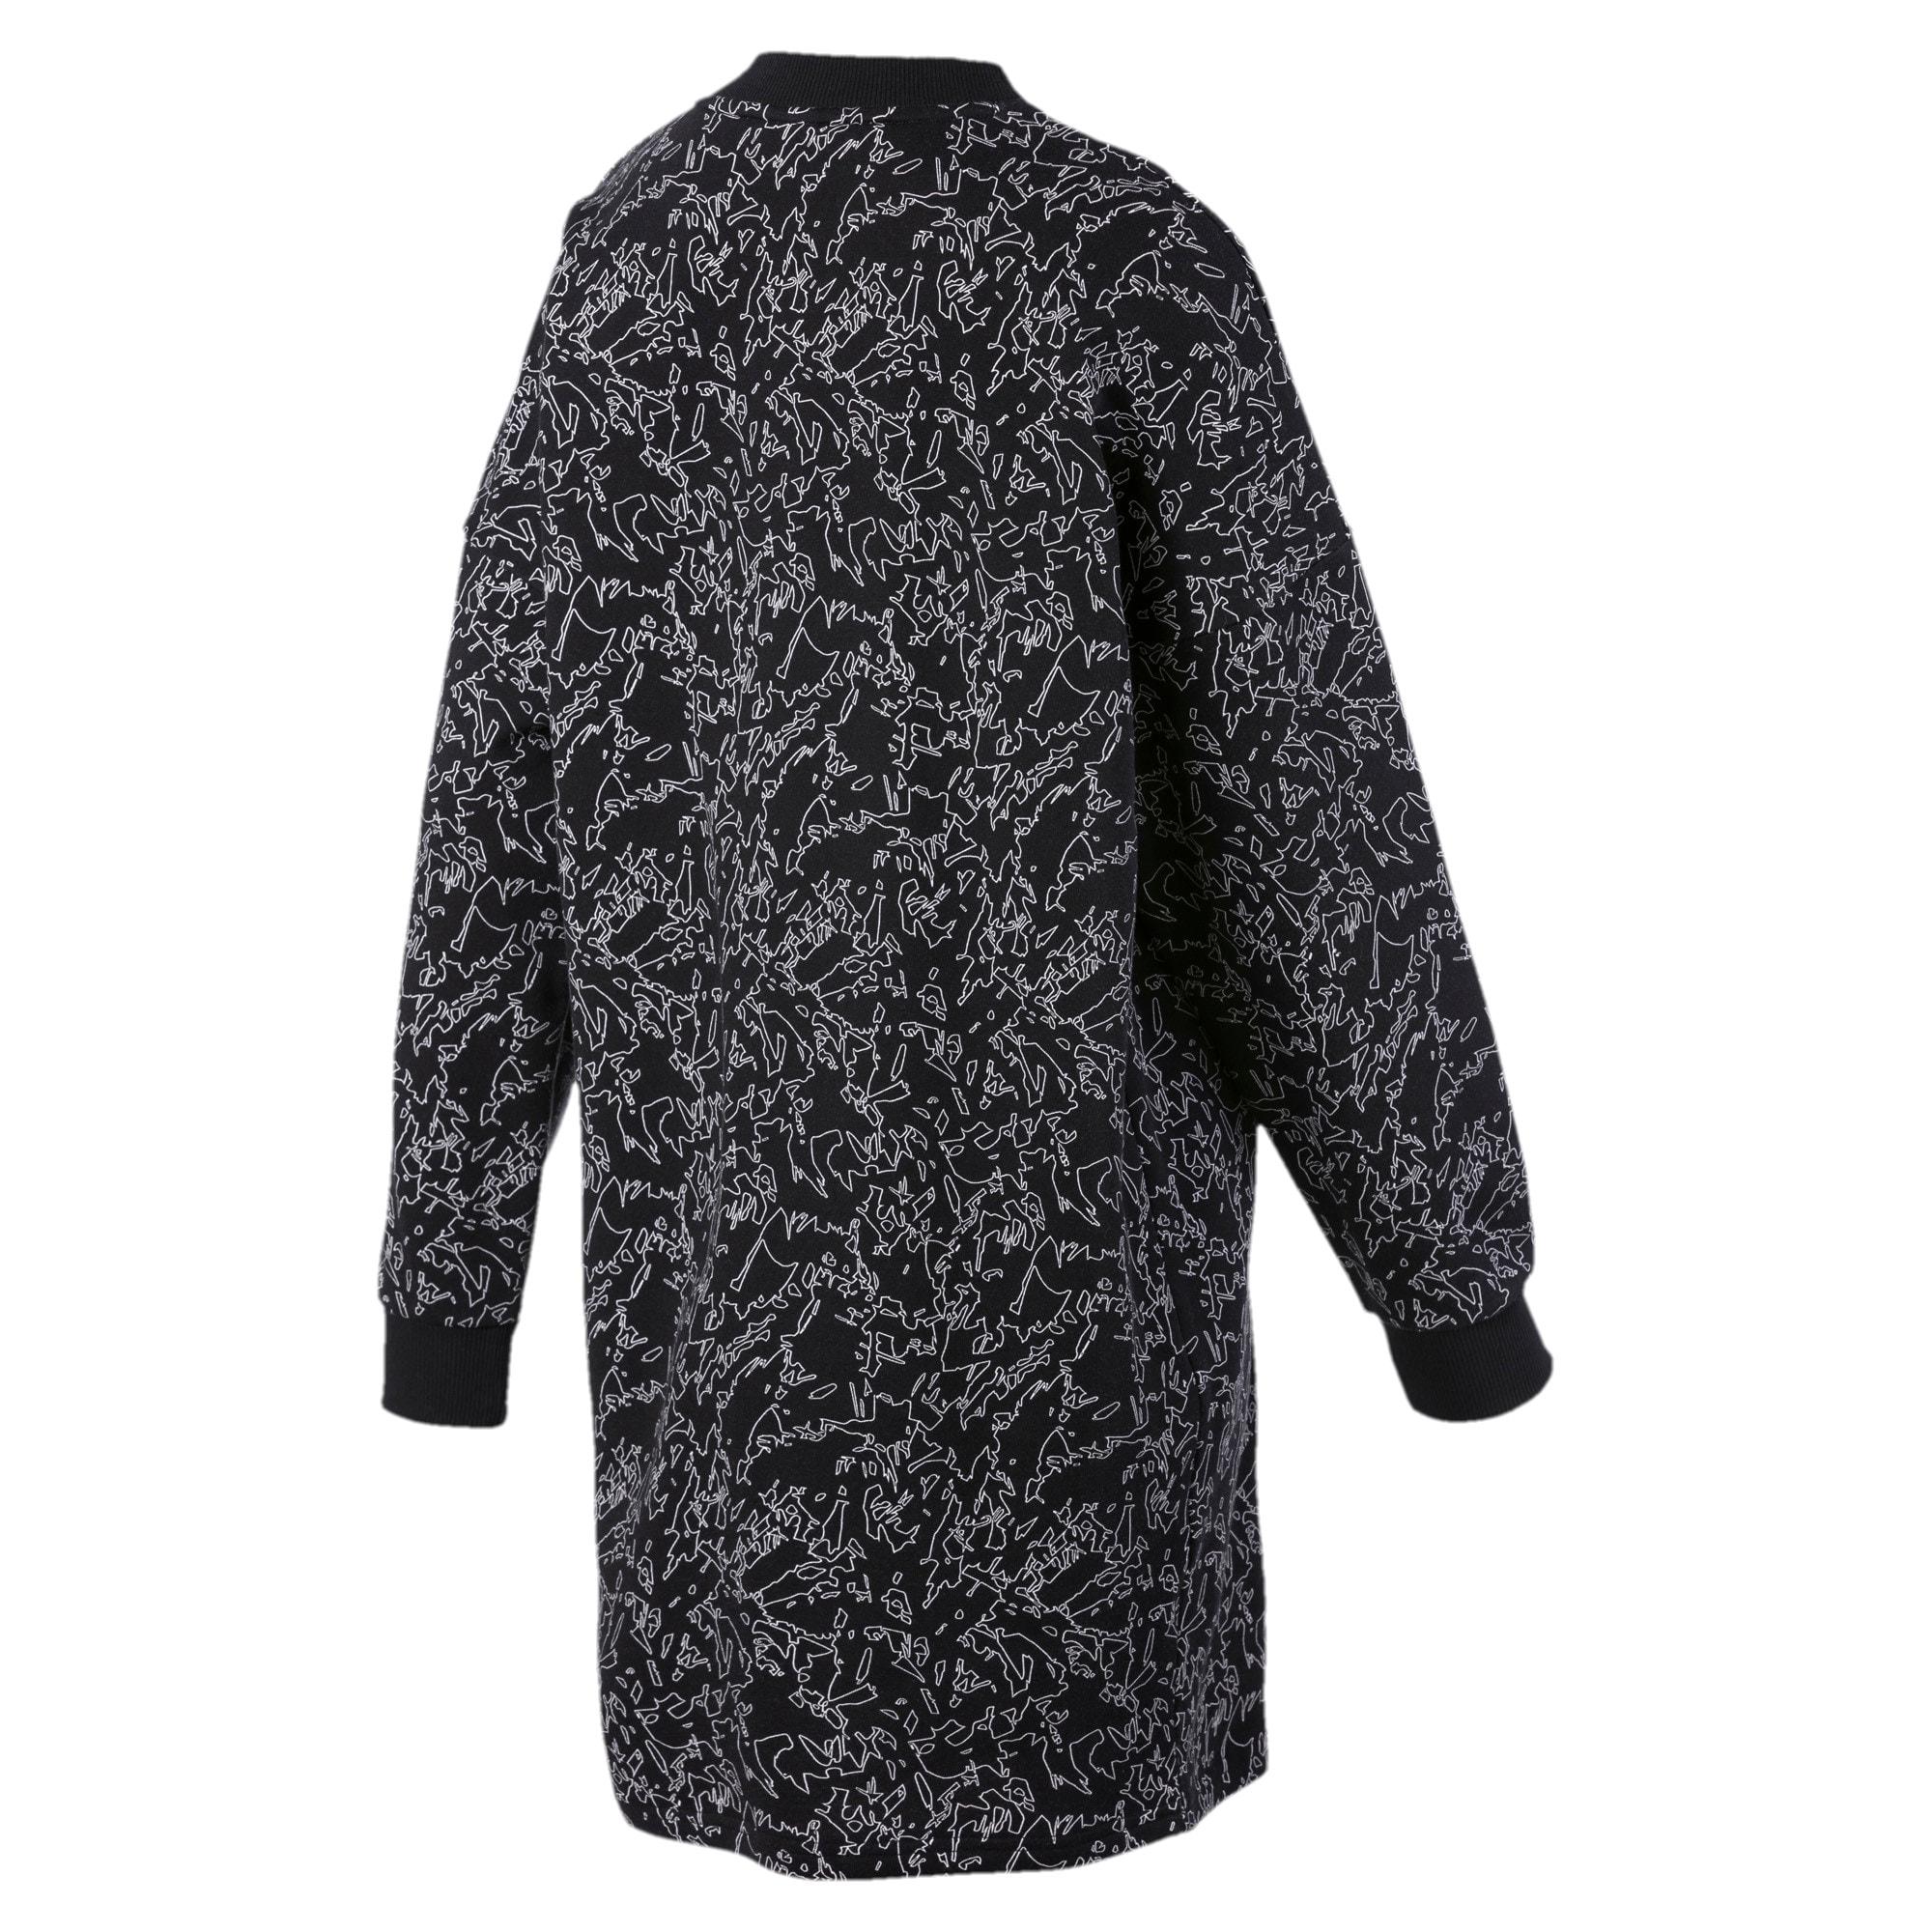 Thumbnail 5 of Classics All-Over Printed Women's Dress, Puma Black, medium